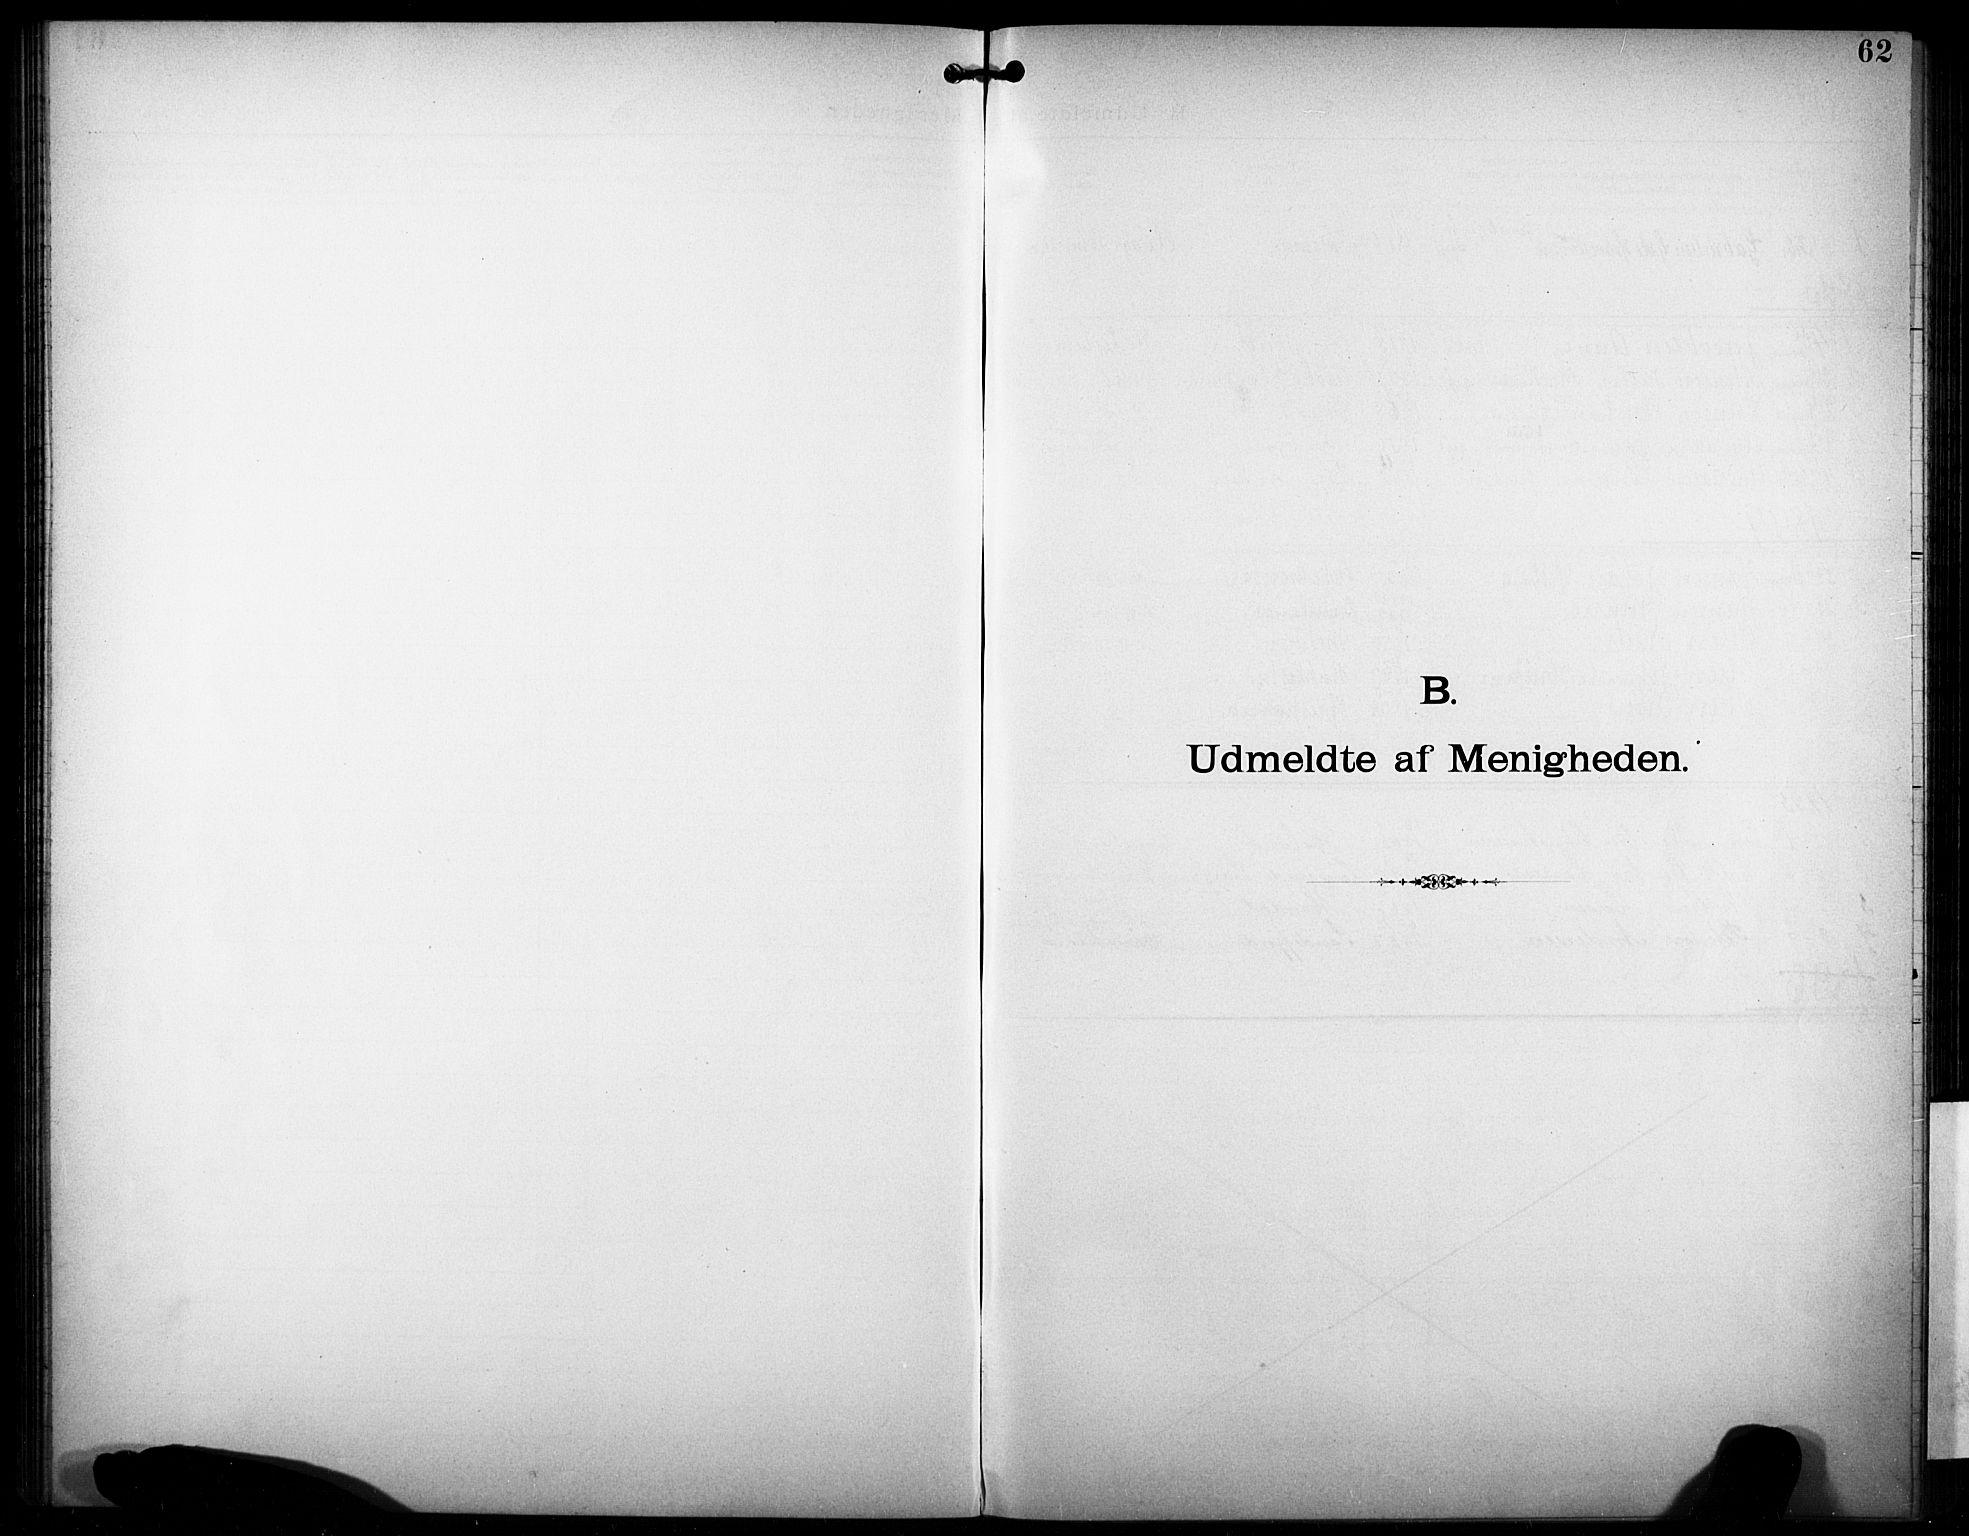 SAKO, Den katolsk-apostoliske menighet i Larvik, F/Fa/L0001: Dissenterprotokoll nr. 1, 1892-1933, s. 62